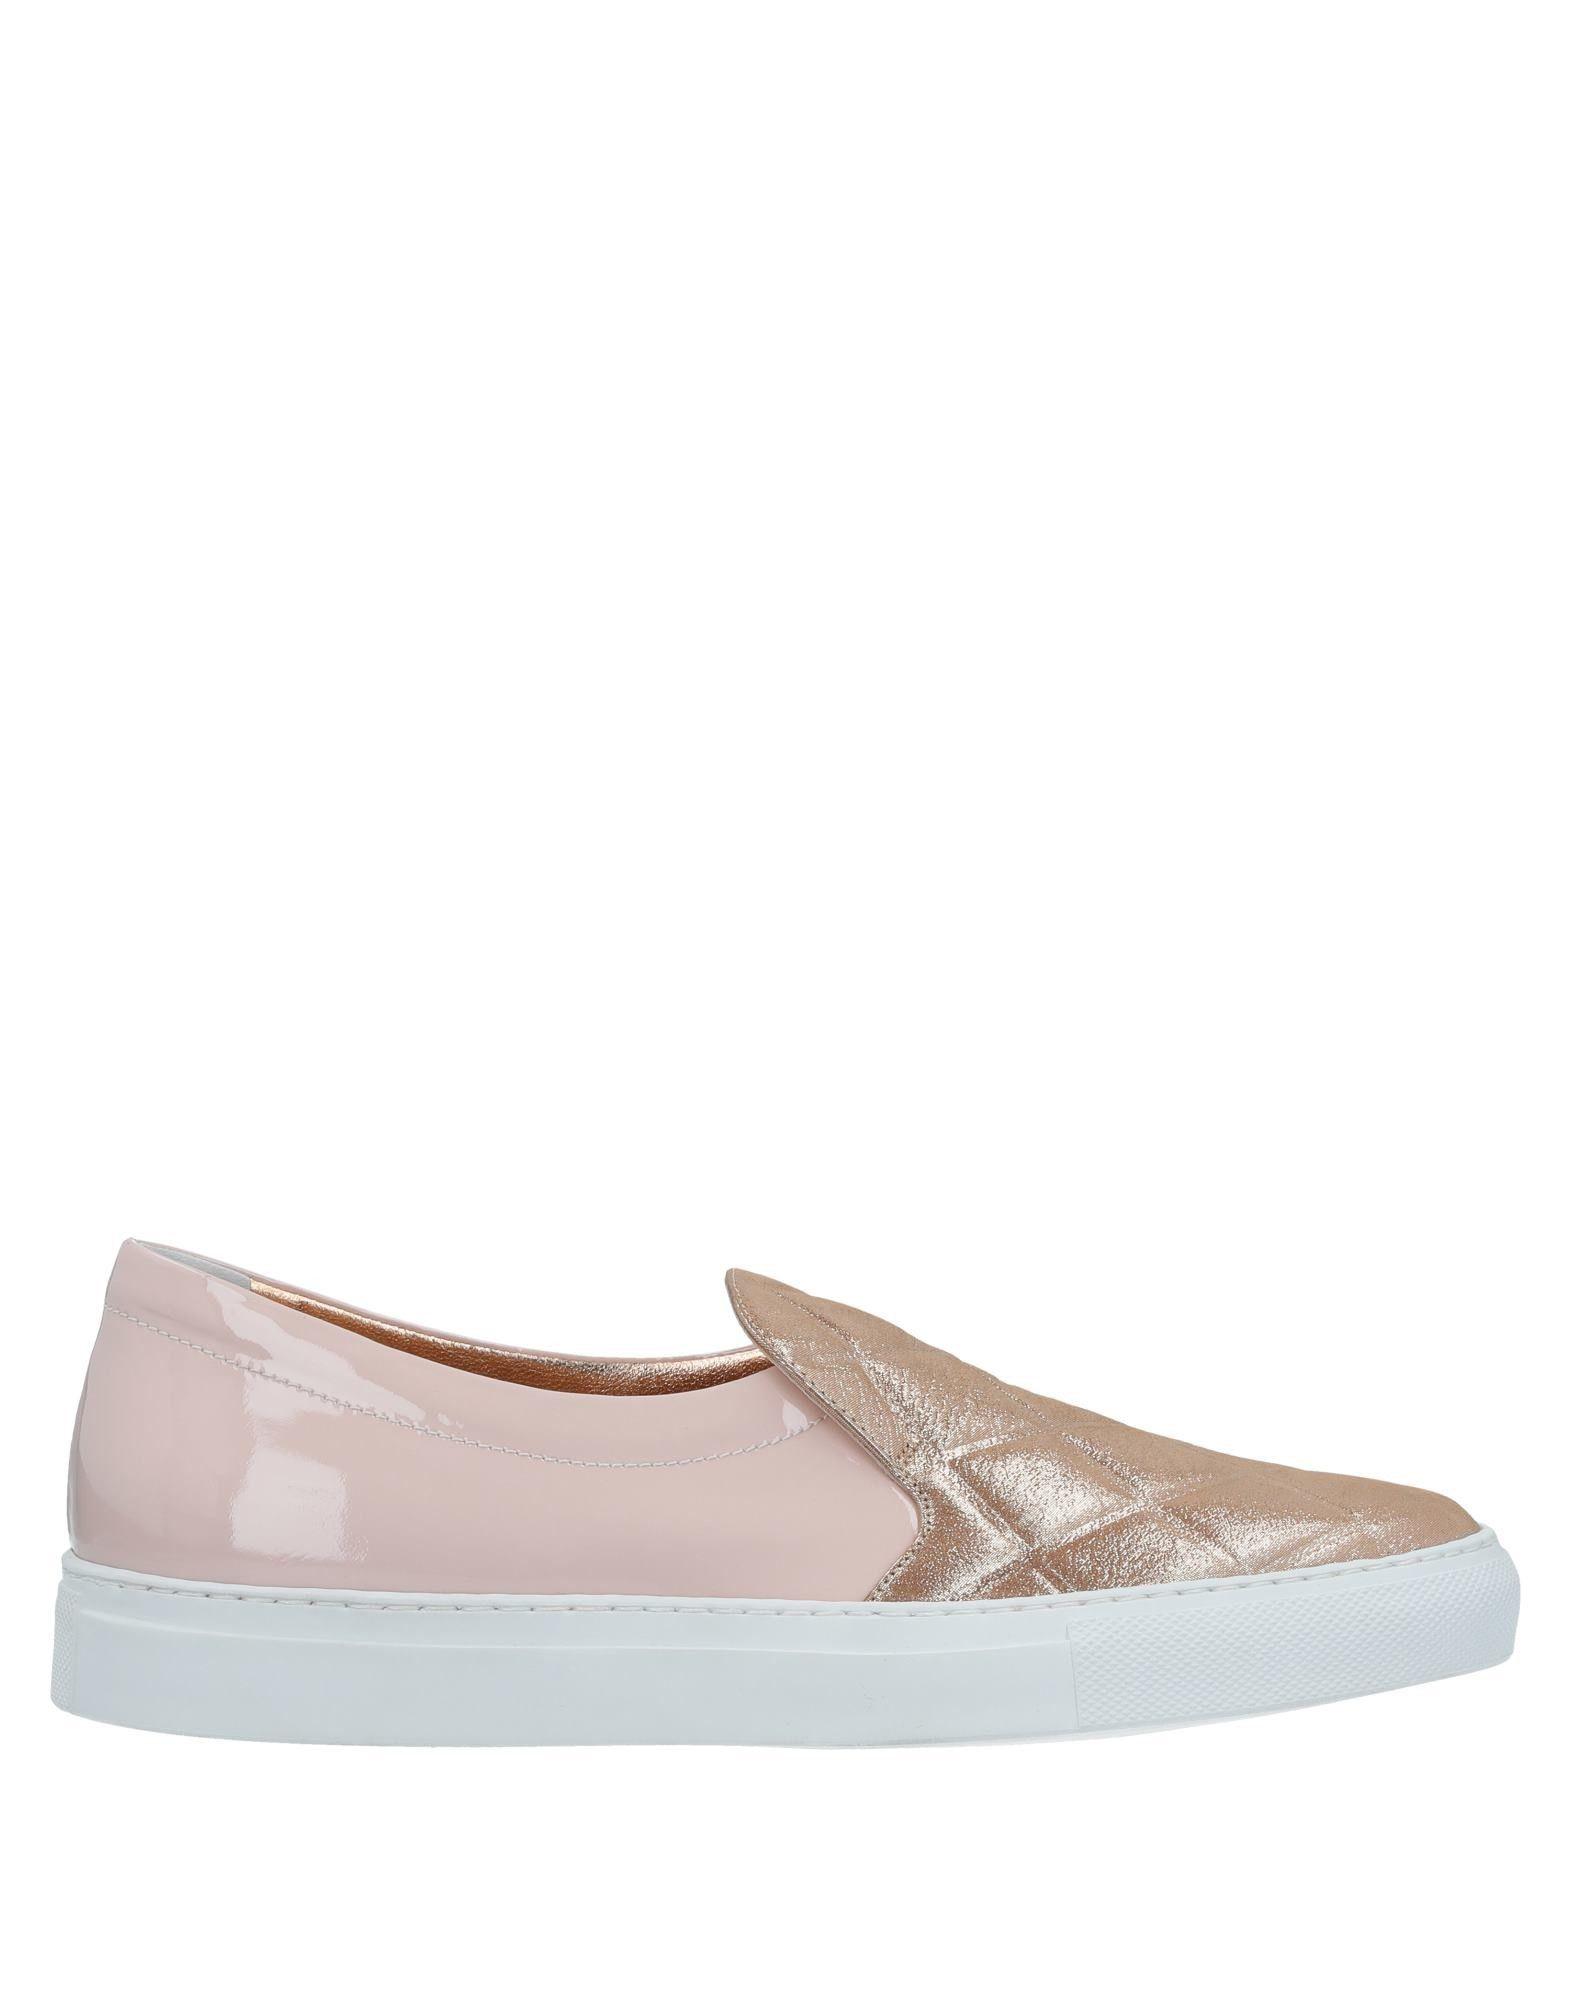 Rodo Sneakers Damen  11527632NHGut aussehende strapazierfähige Schuhe